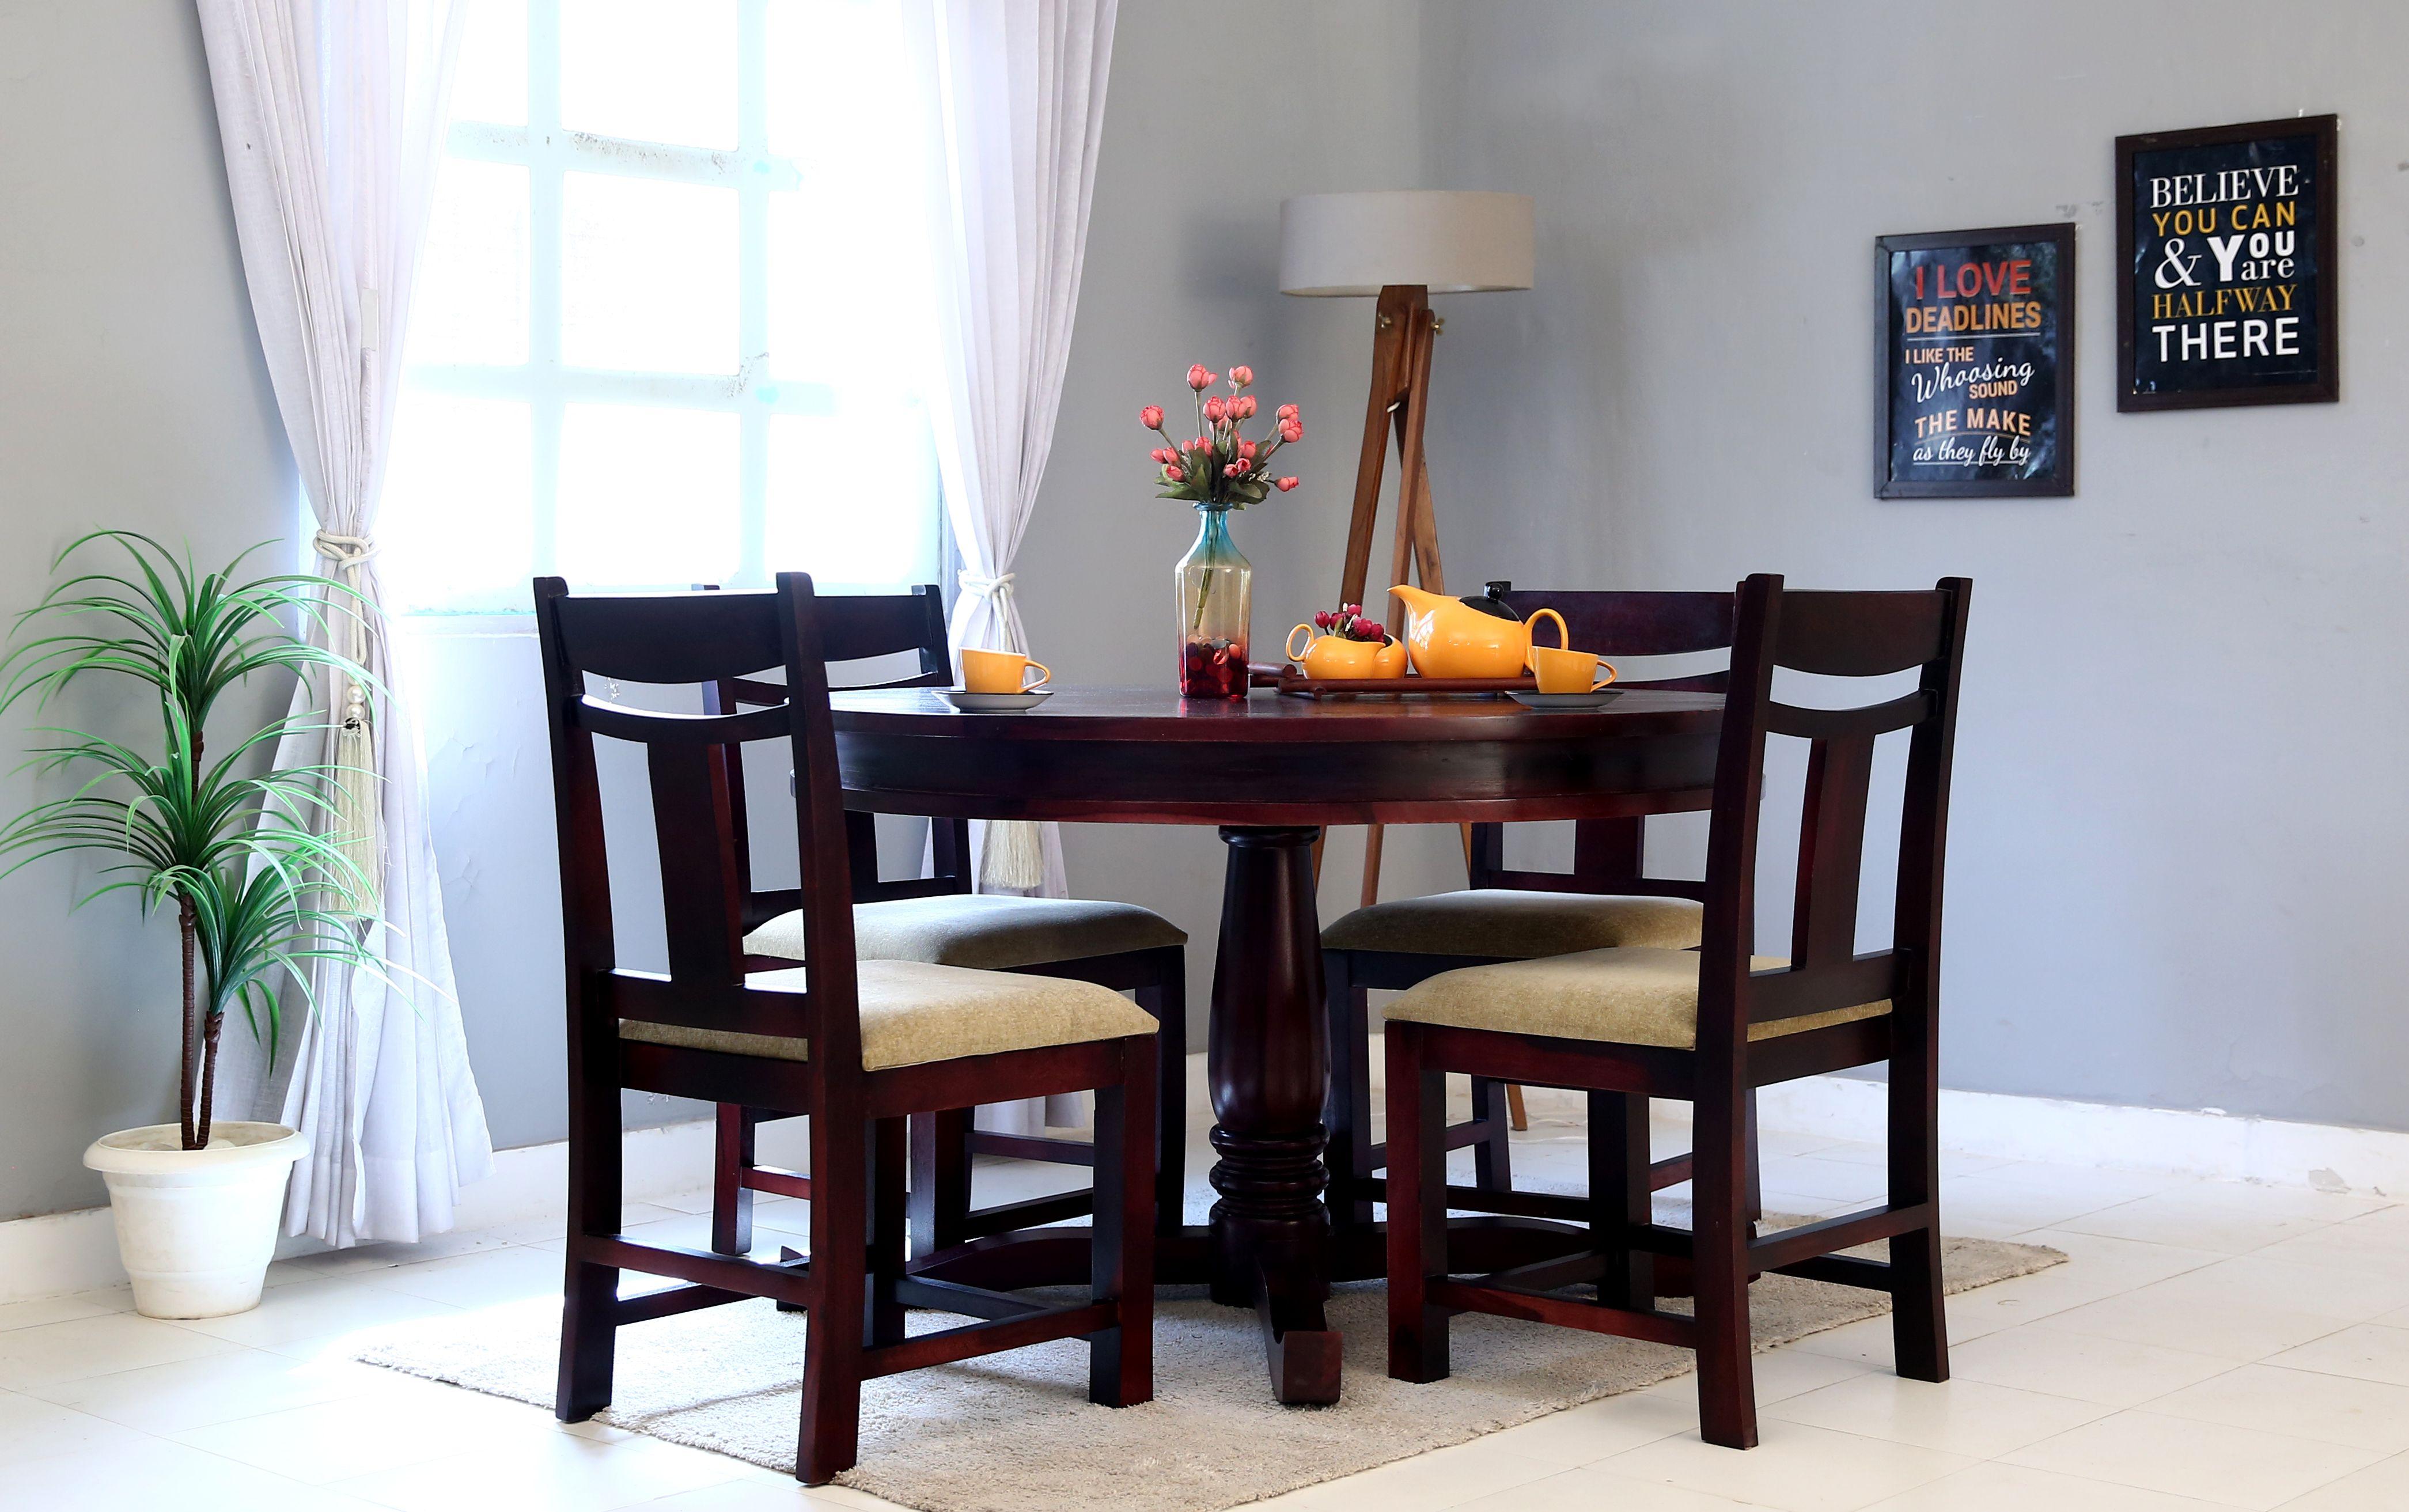 Buy Isadora 4 Seater Round Dining Set Honey Finish Online In India Round Dining Set Dining Set Round Dining